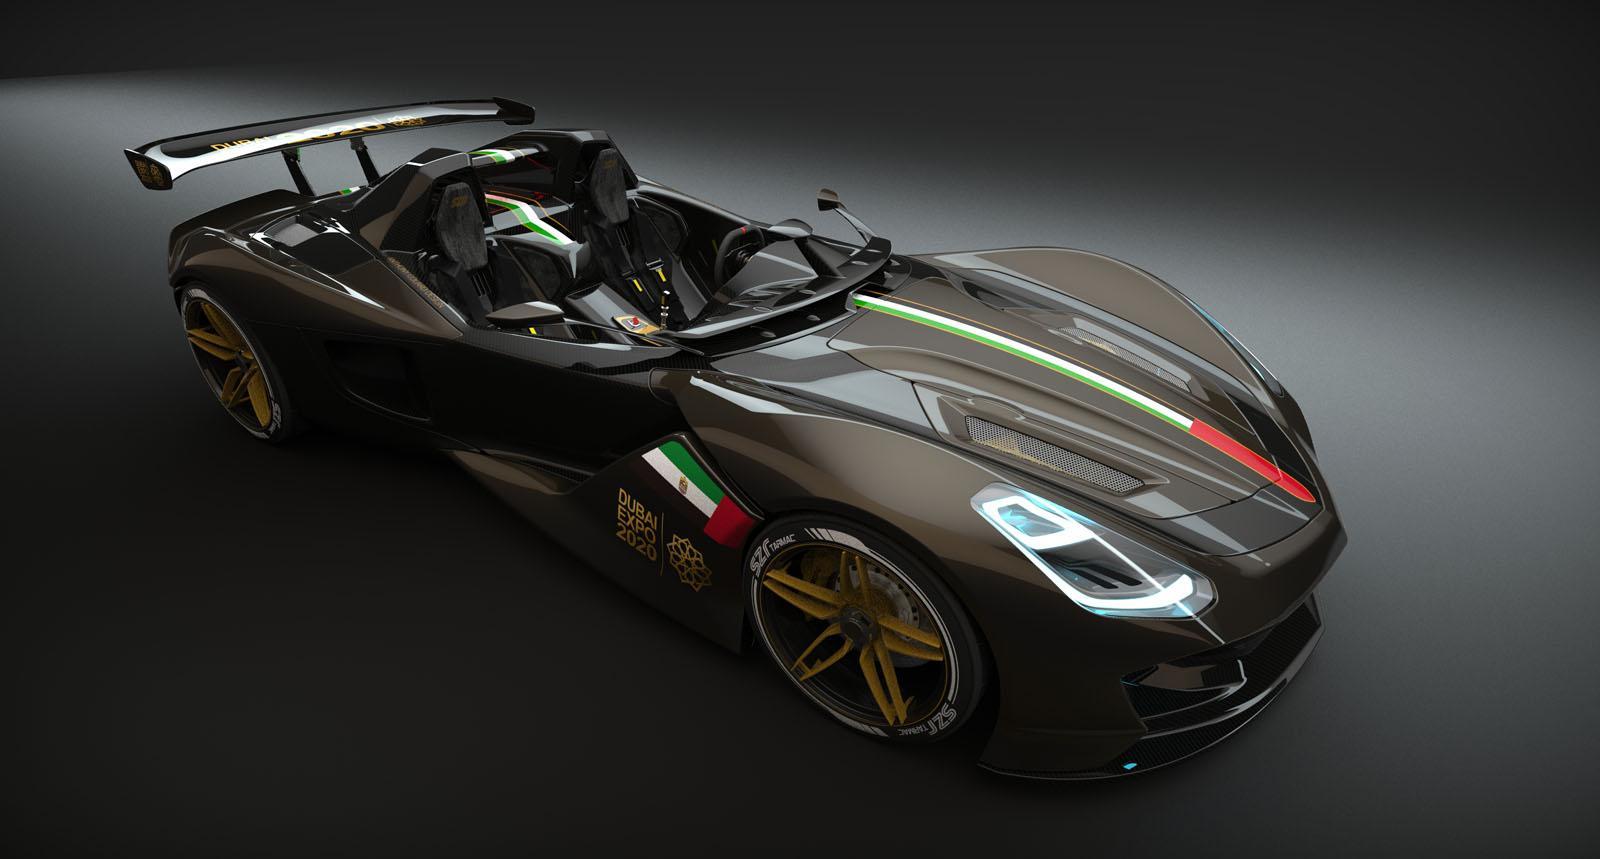 dubai roadster concept  el s u00faper deportivo  u00e1rabe